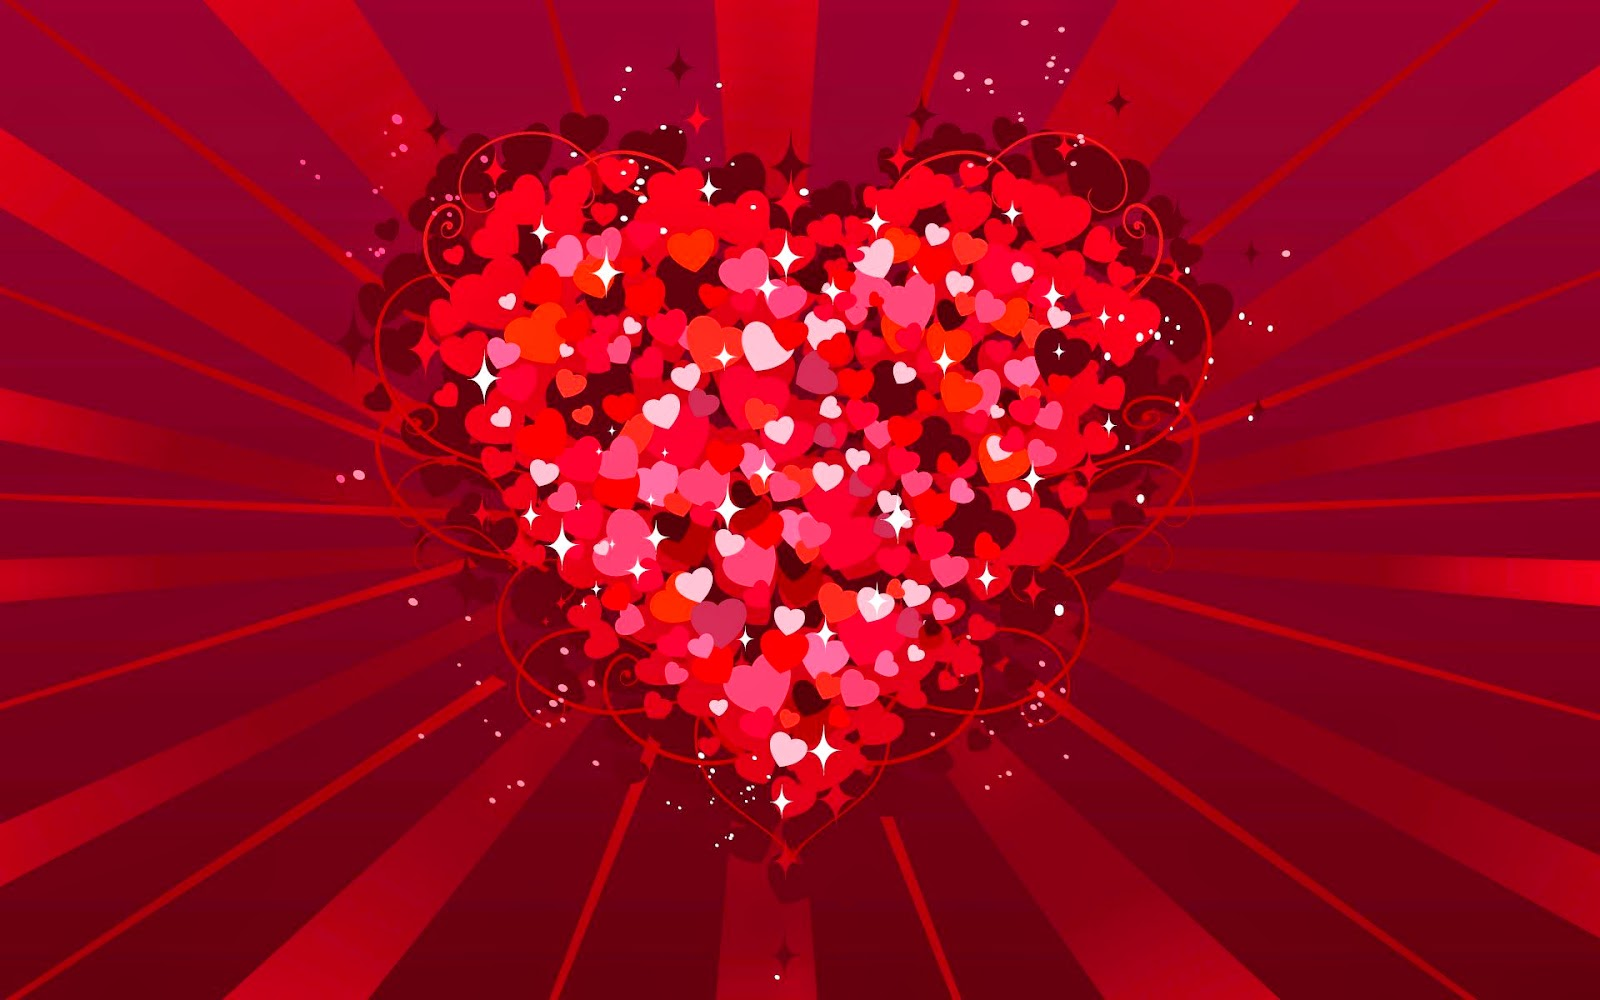 Imagenes de San Valentin, parte 3